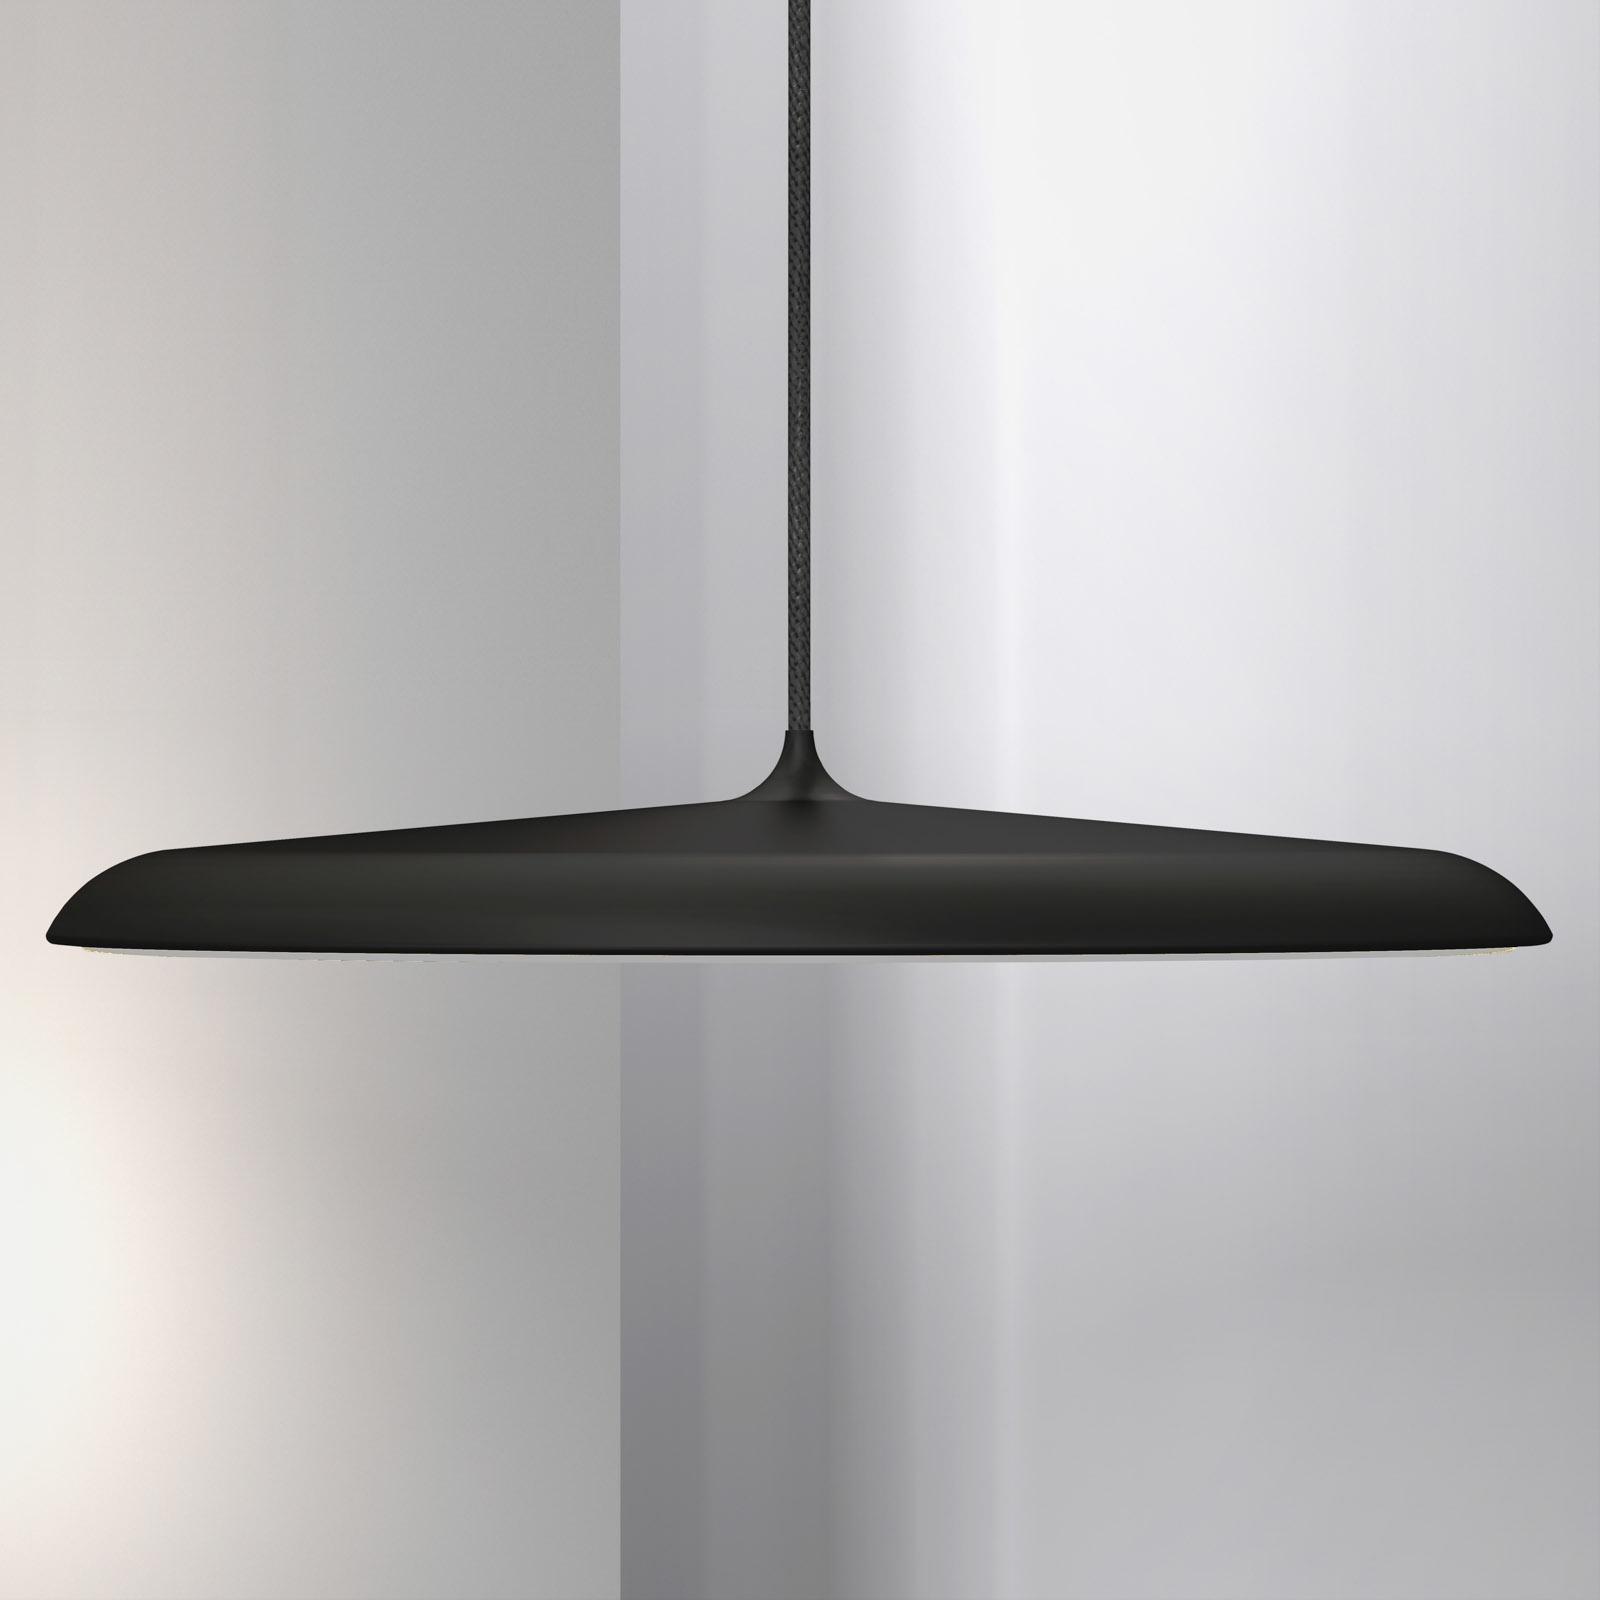 Lampa wisząca LED Artist, Ø 40 cm, czarna